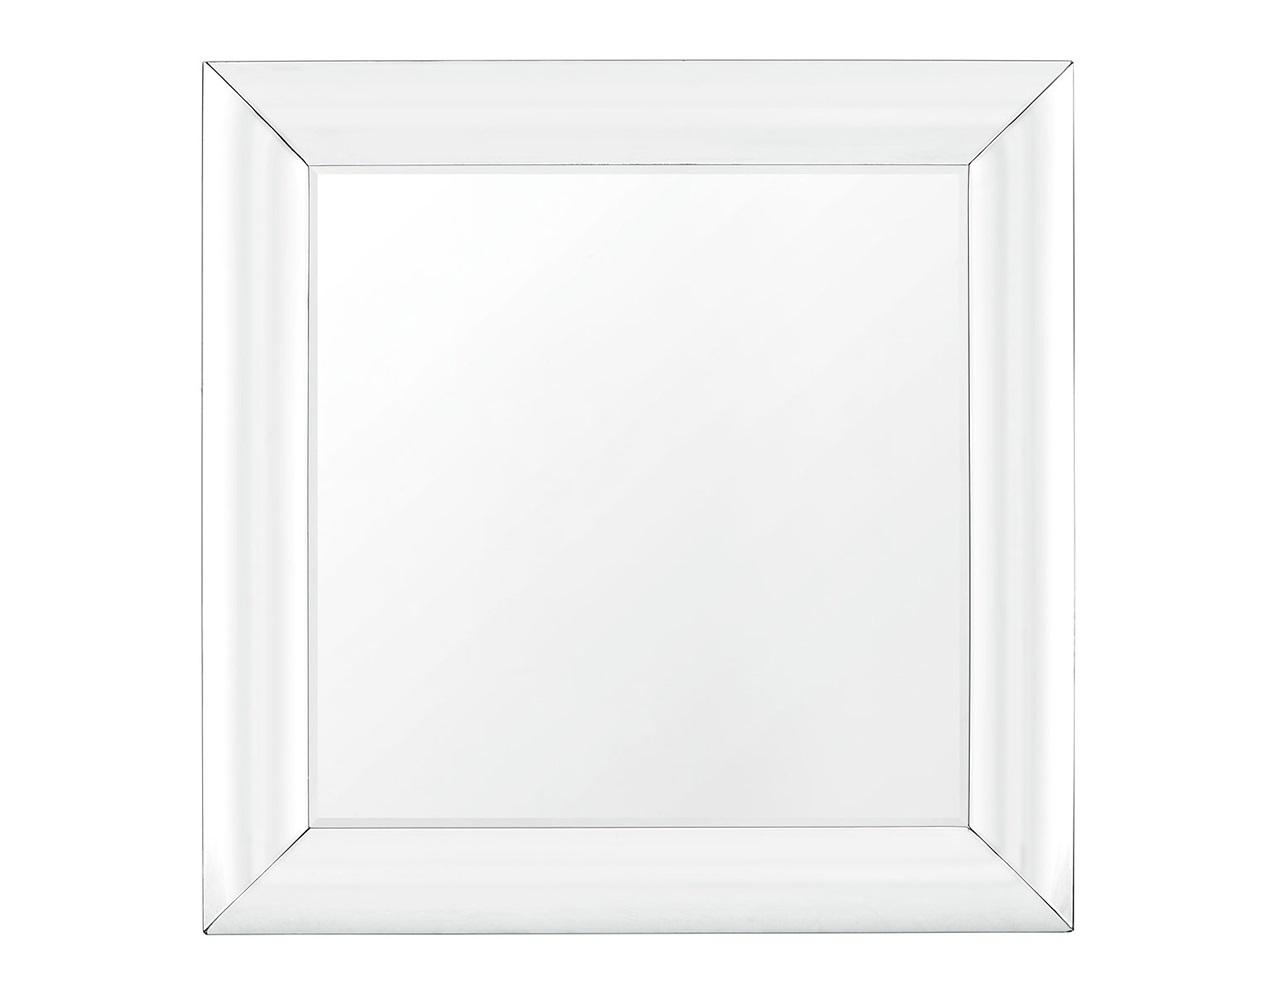 ЗеркалоНастенные зеркала<br>Зеркало Mirror Cipullo в выпуклой зеркальной раме.<br><br>Material: Стекло<br>Width см: 100<br>Height см: 100